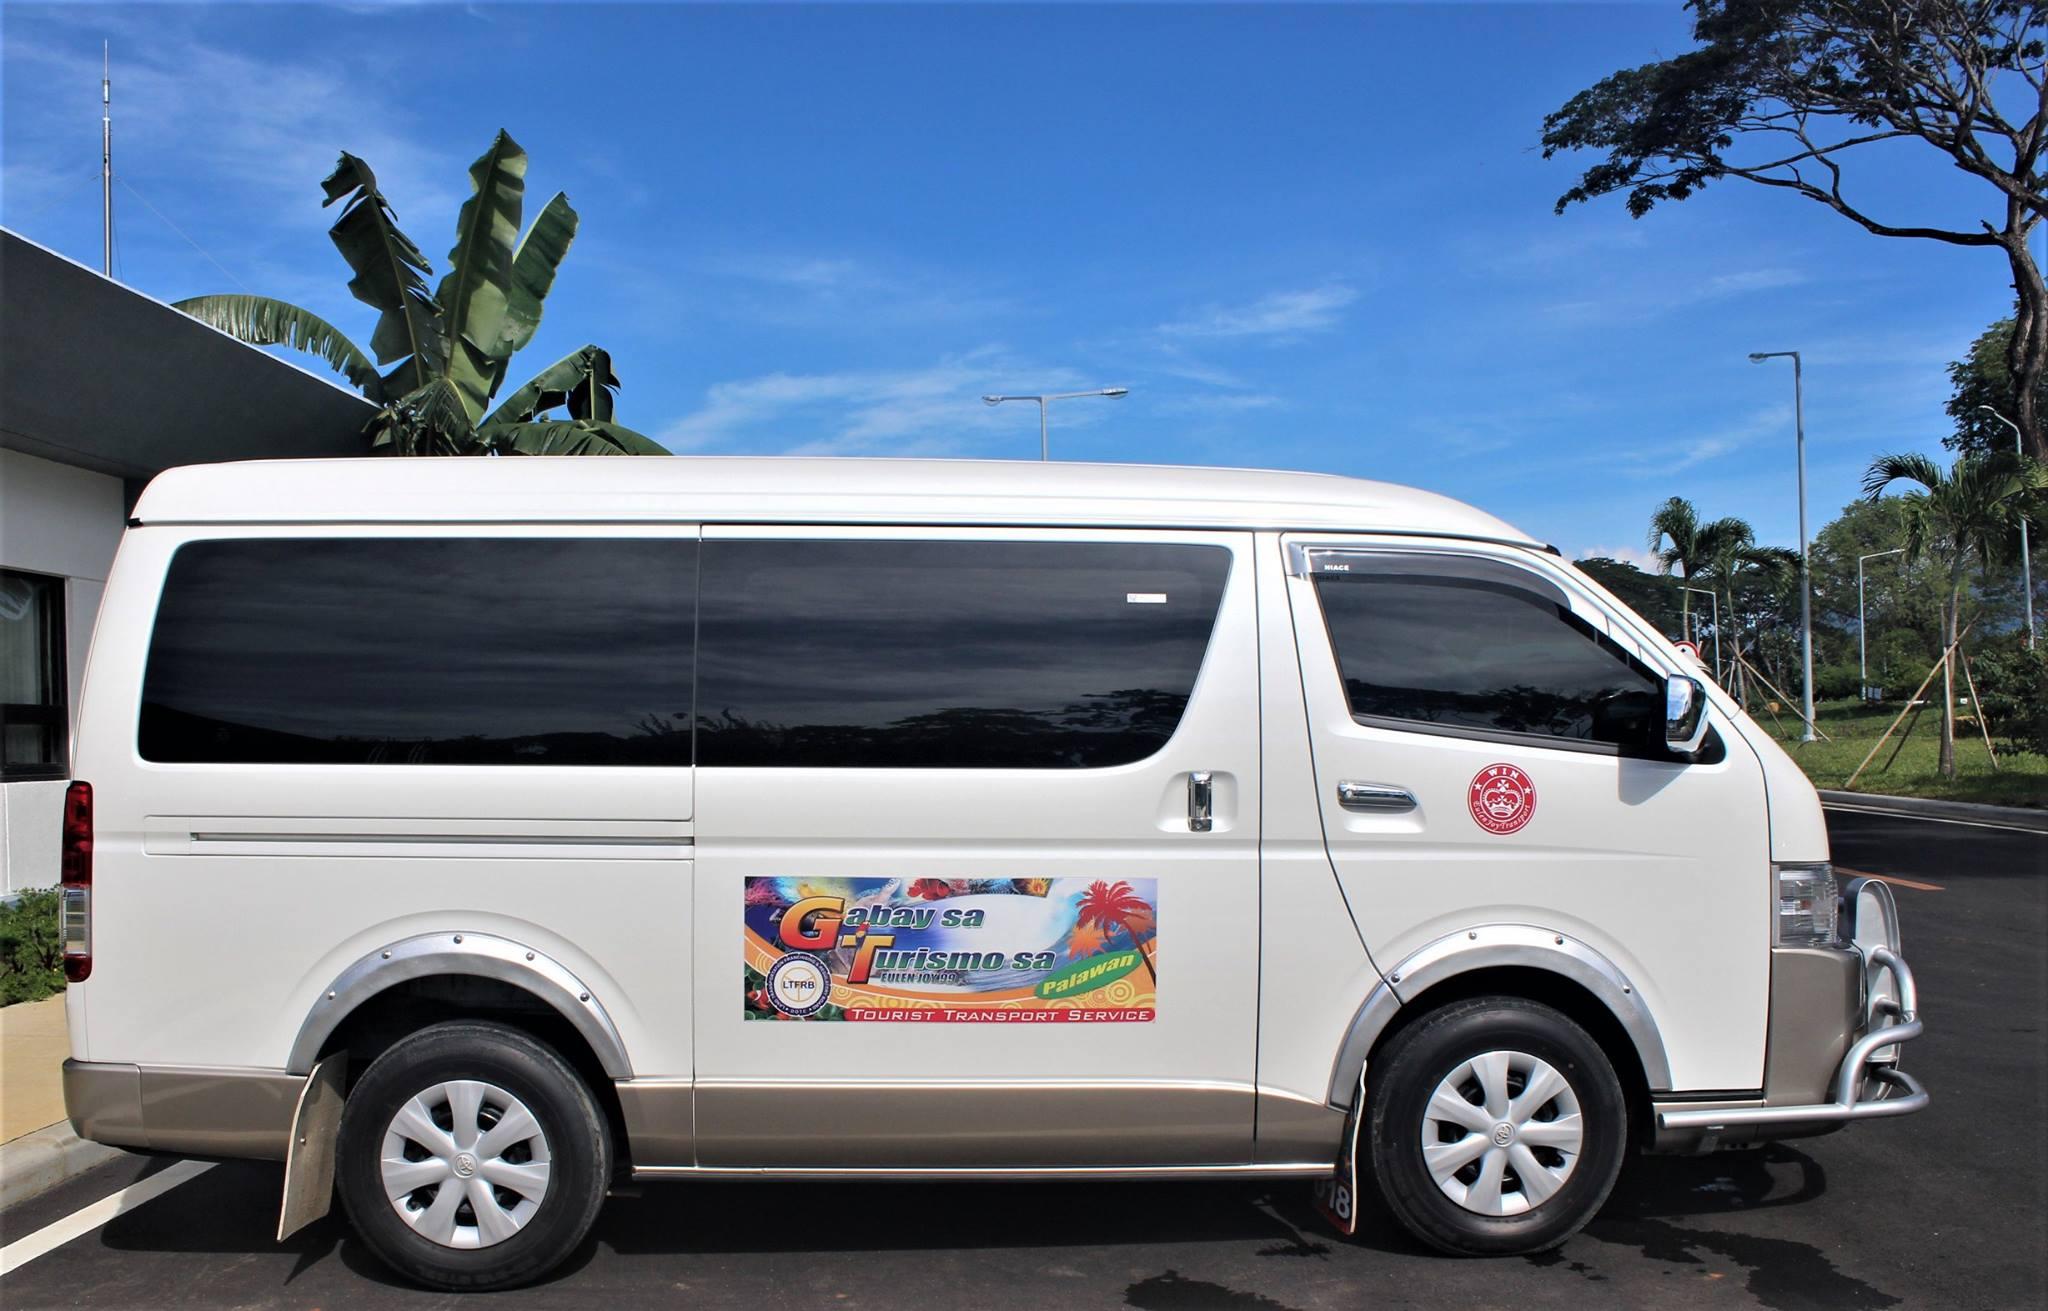 Eulen Joy Express Van Side